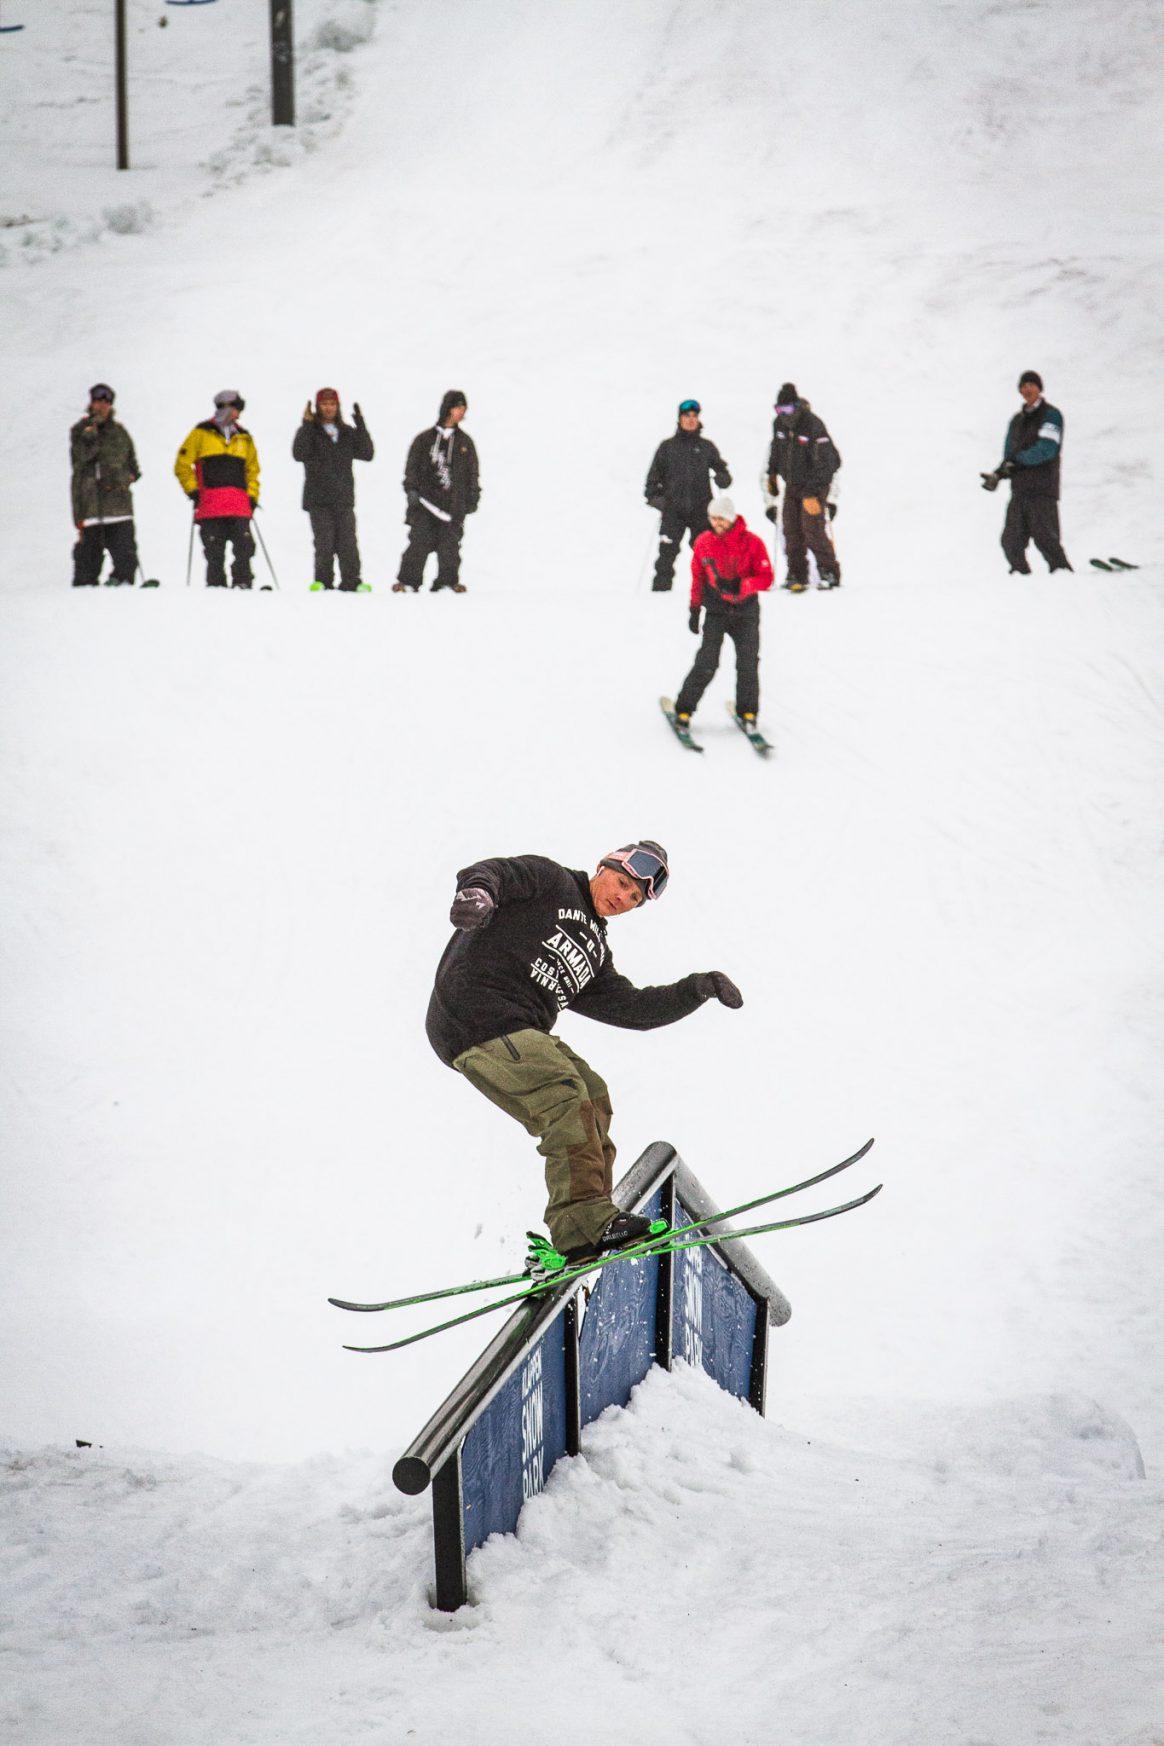 Oliver Karlberg slides a rail on Day 2 at Kimbo Sessions.